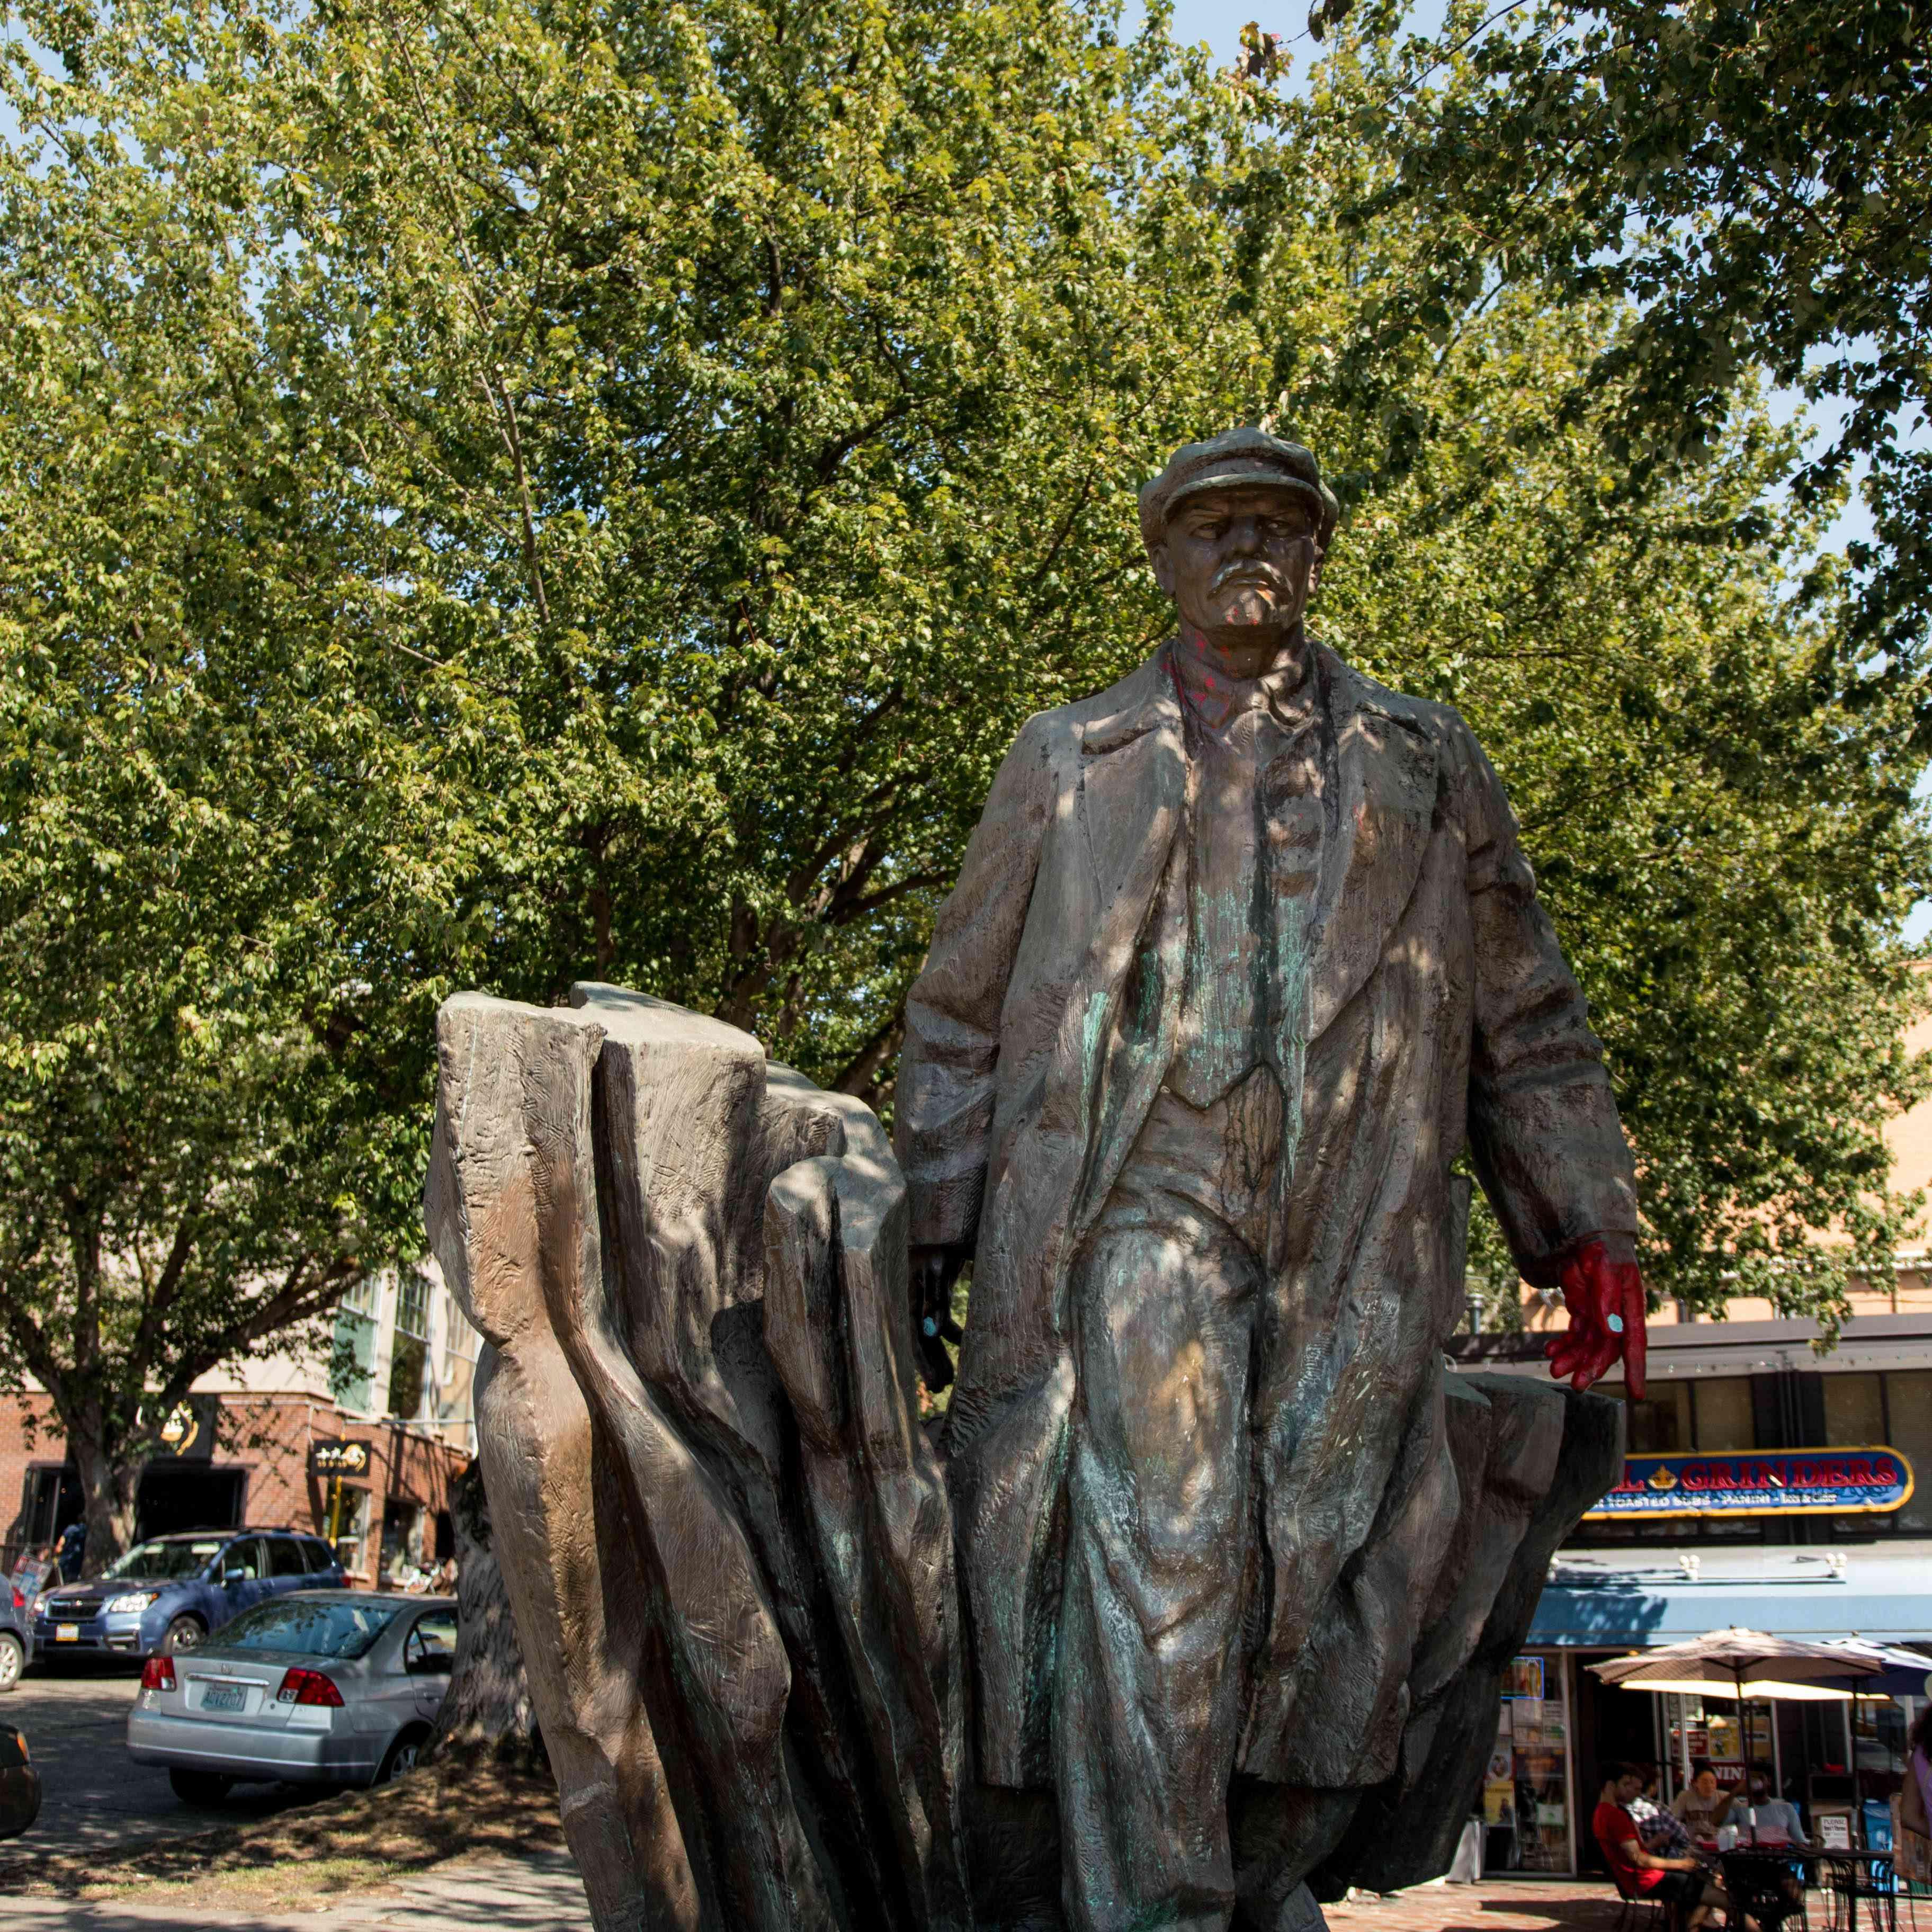 Statue of Vladimir Lenin, Fremont Street, Seattle, Washington